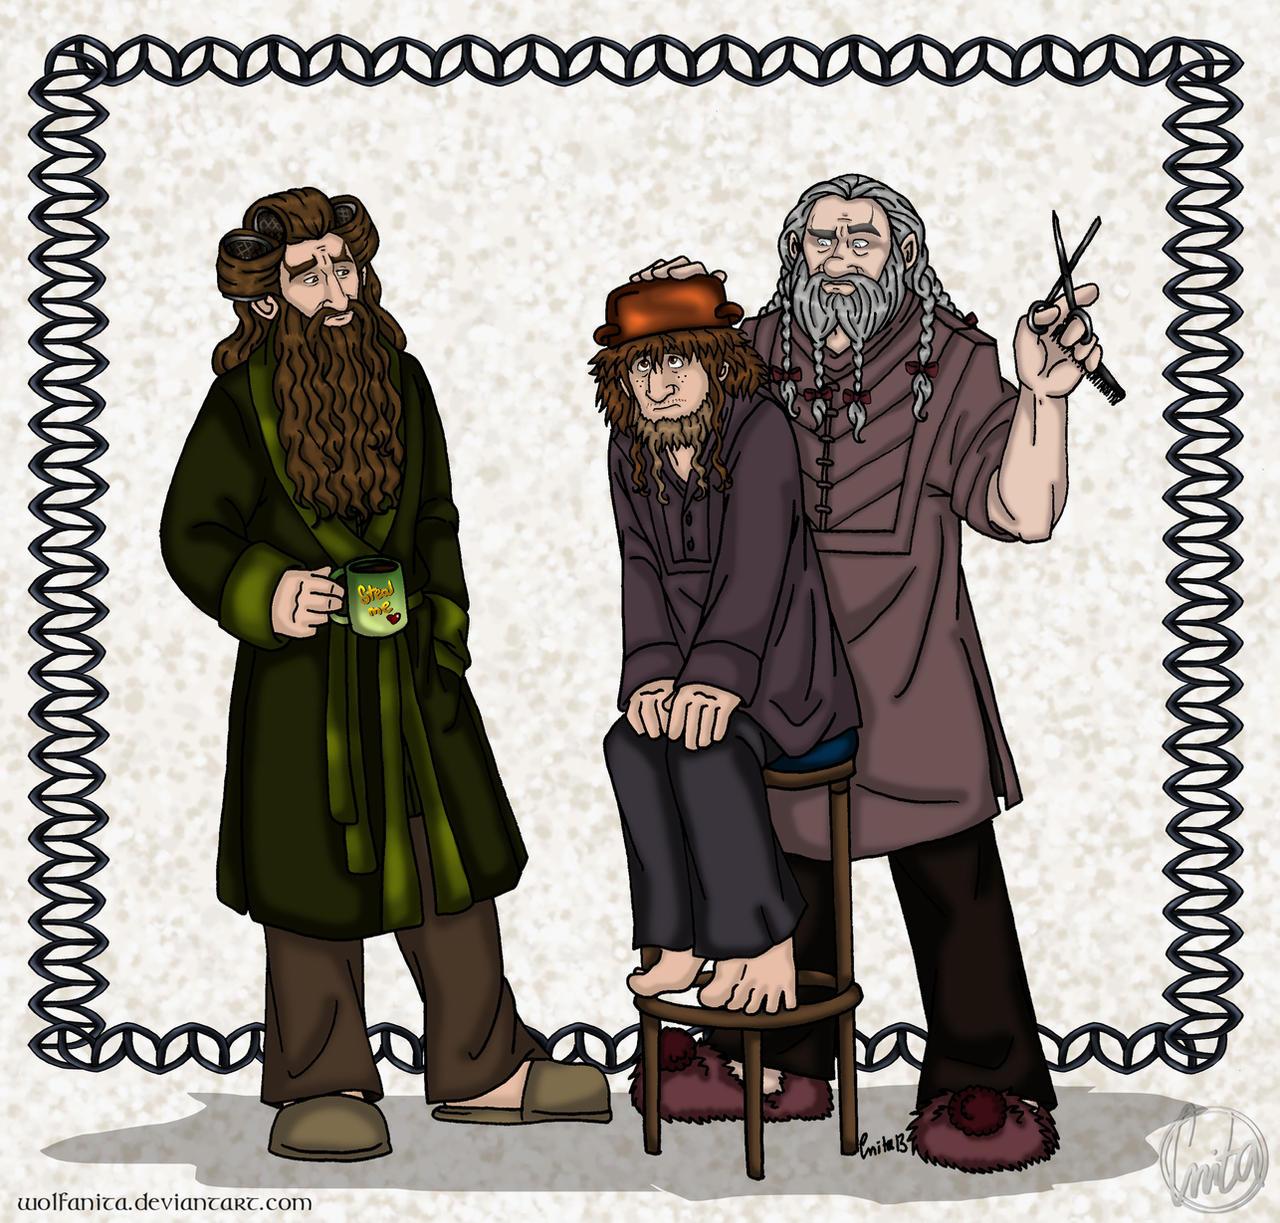 ArtTrade: The Hobbit: Hair Care by wolfanita